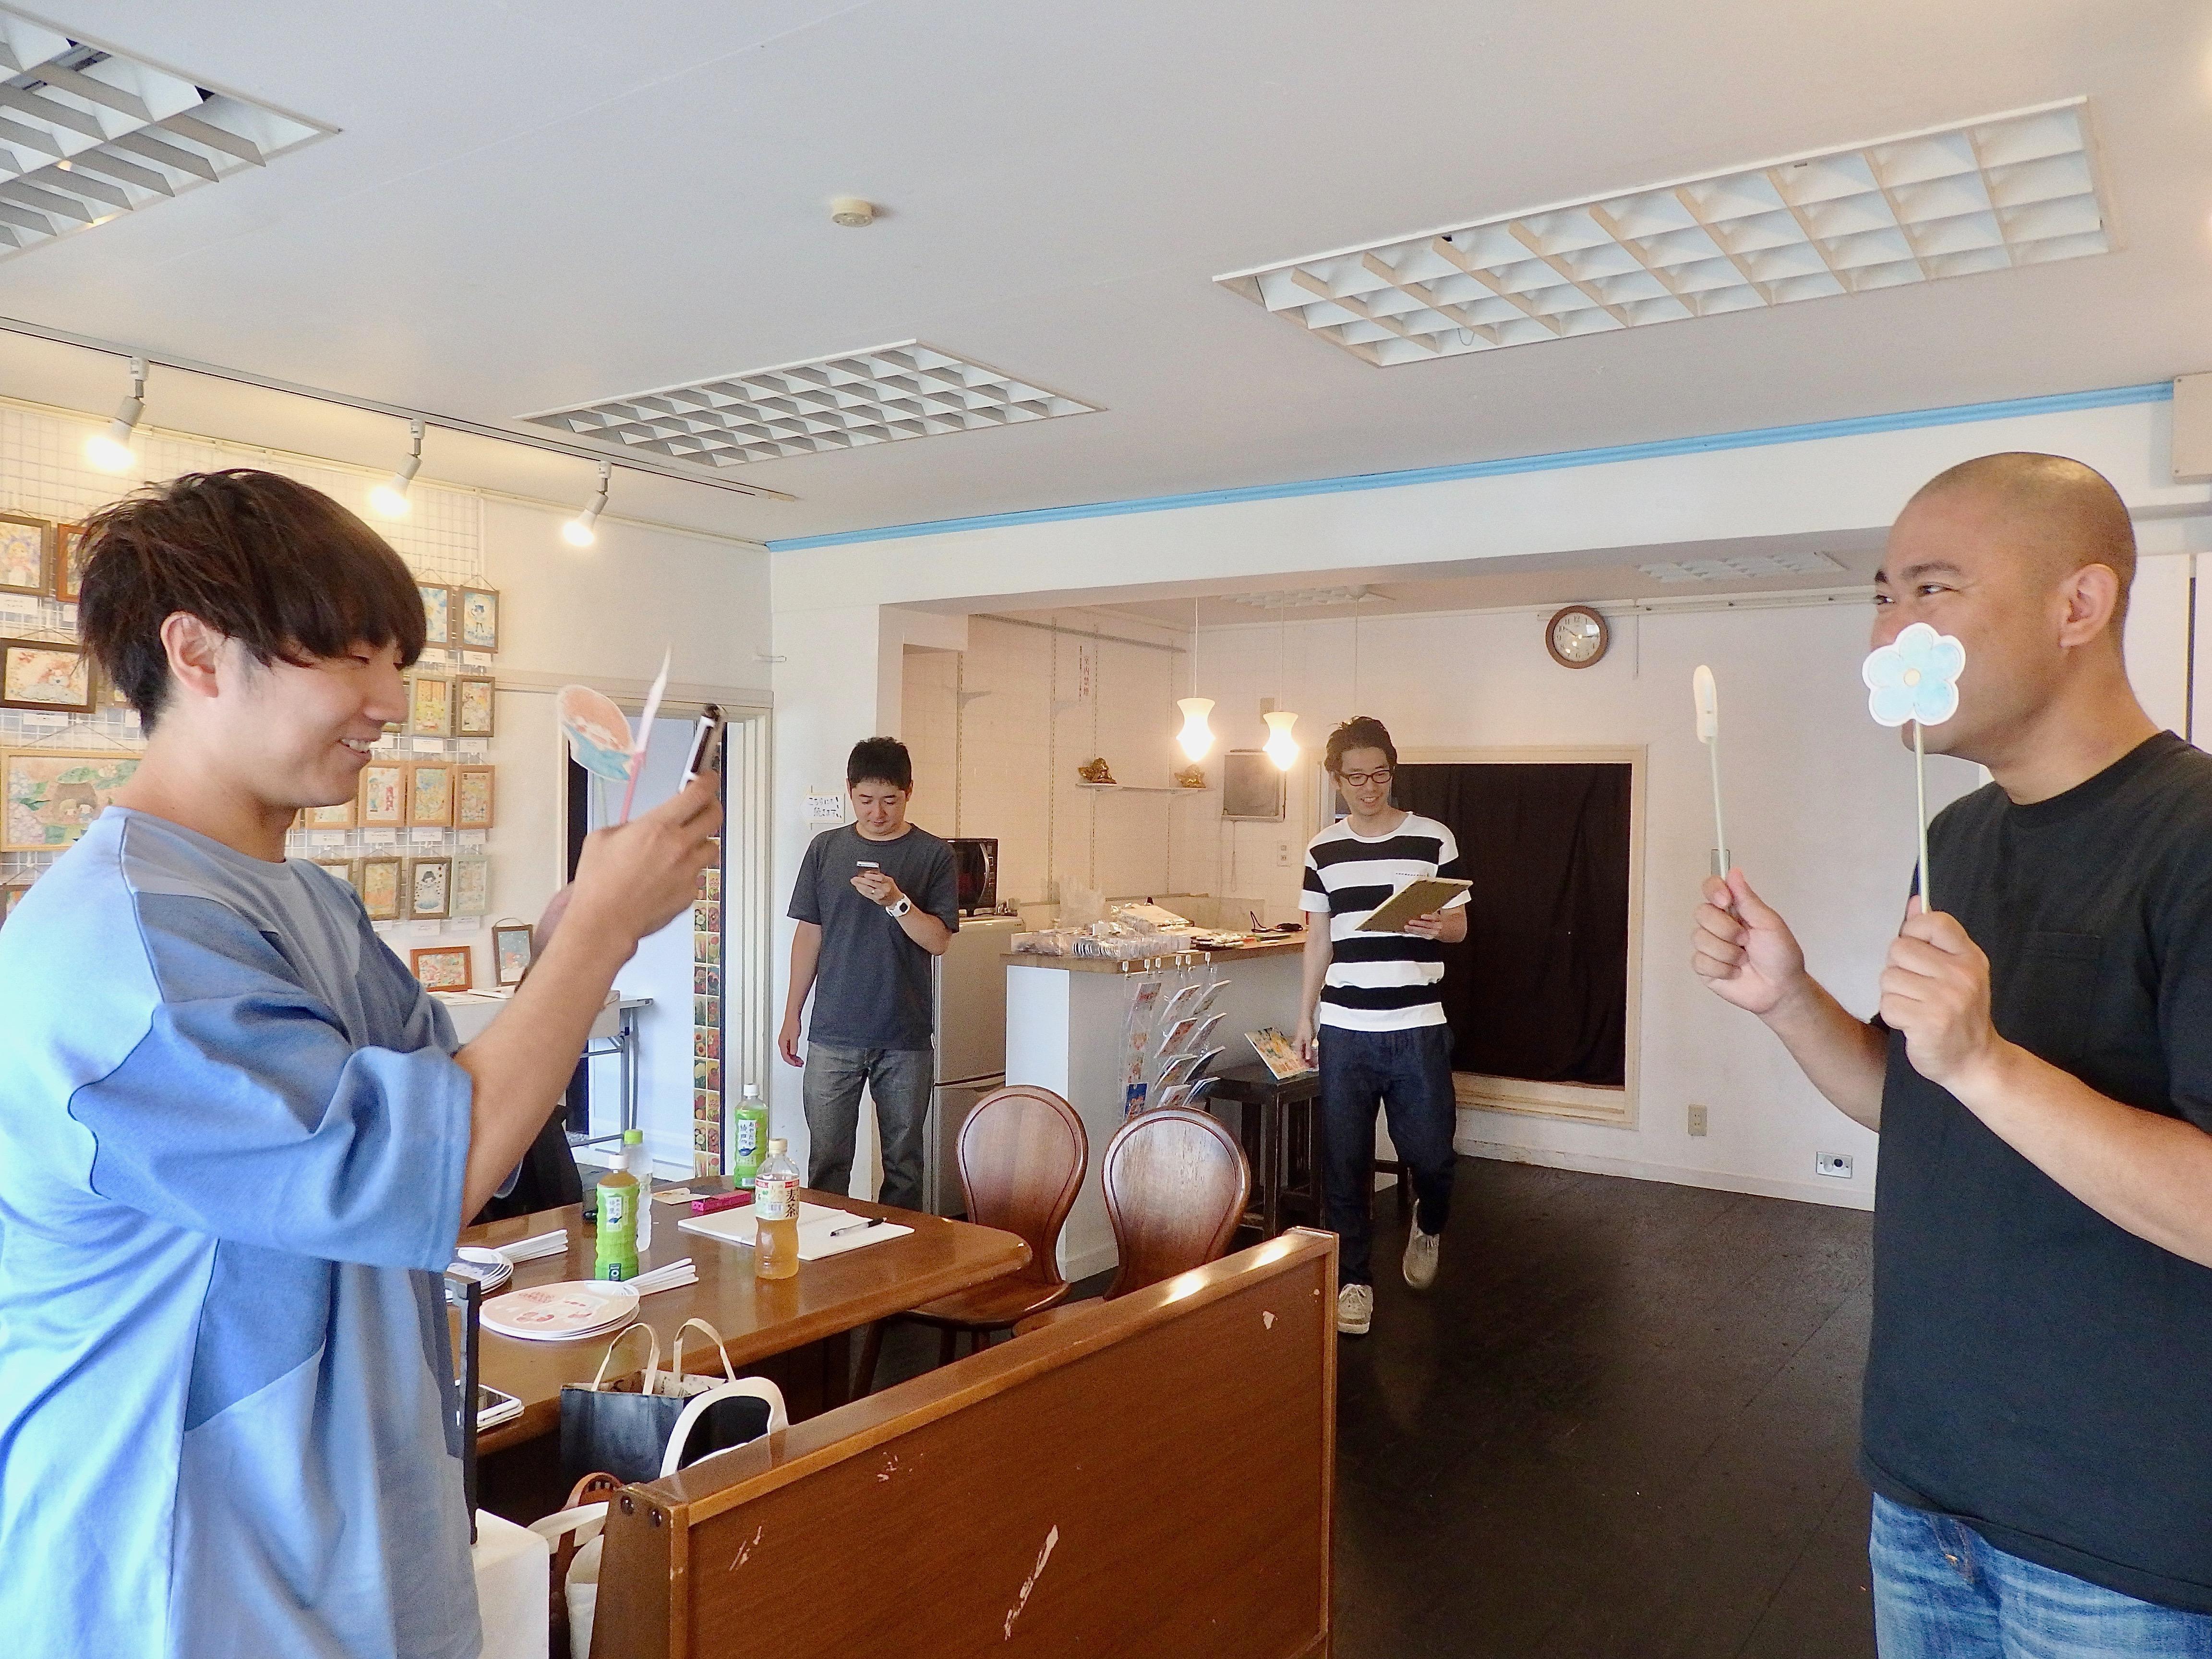 http://news.yoshimoto.co.jp/20170803182628-bfef307b37bf01722f39a1ca91af04fbac9b30b6.jpg